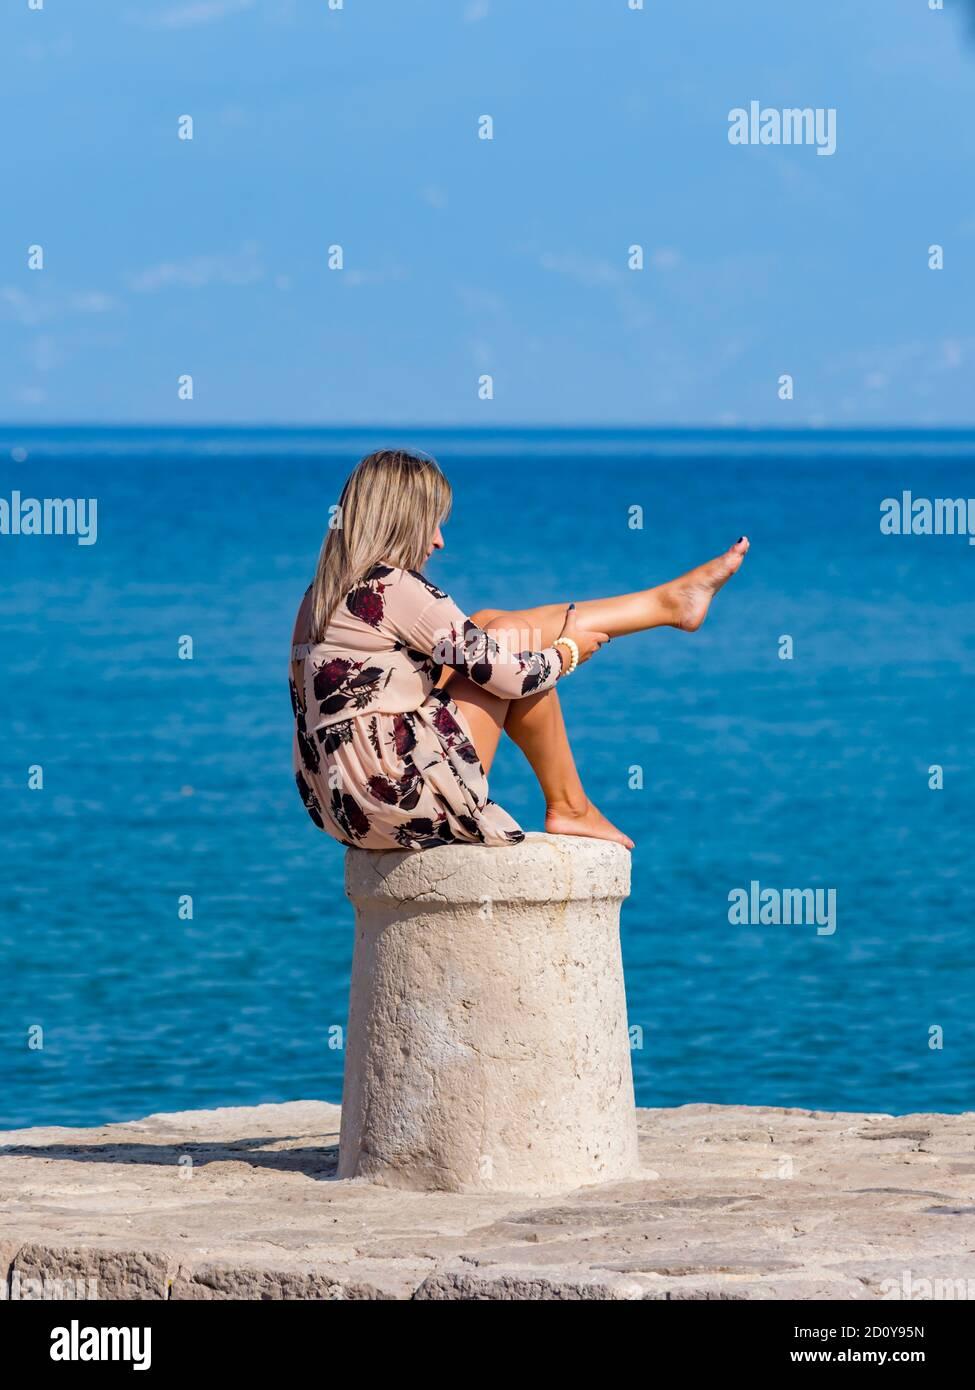 Young woman sitting on stone marine maritime harbor harbour bollard barefoot Stock Photo